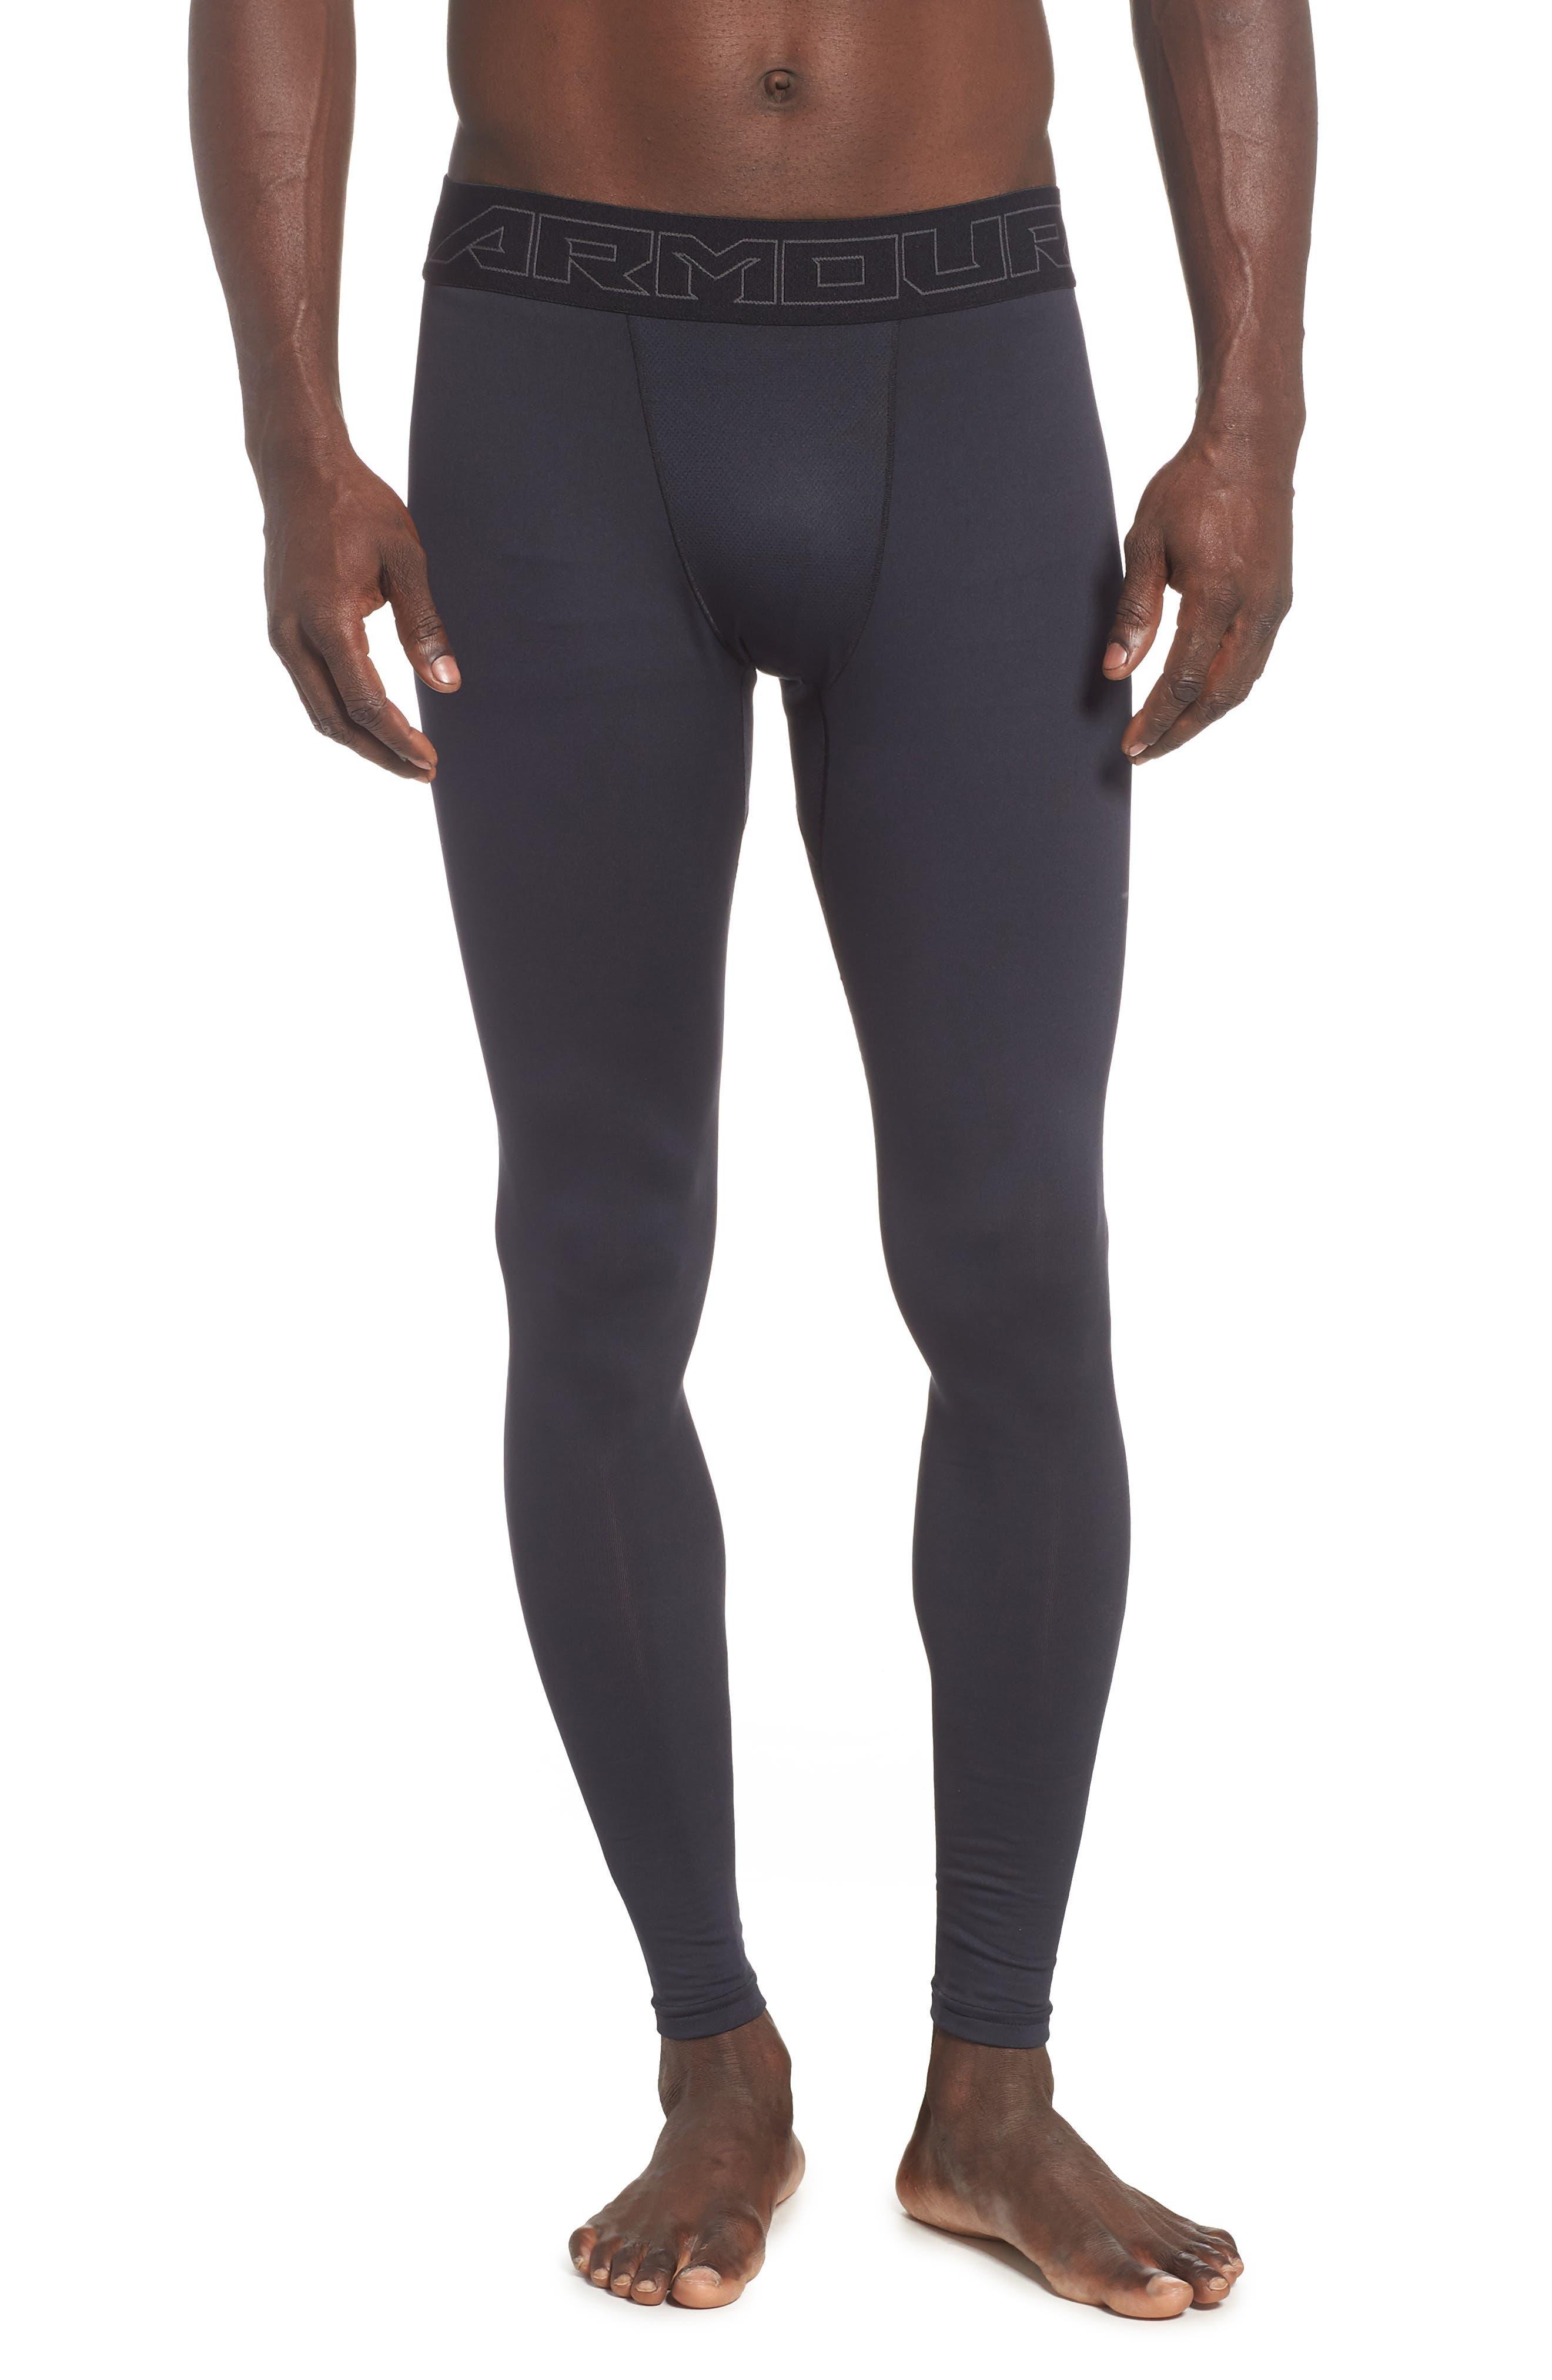 ColdGear<sup>®</sup> Leggings,                             Main thumbnail 1, color,                             BLACK/ CHARCOAL